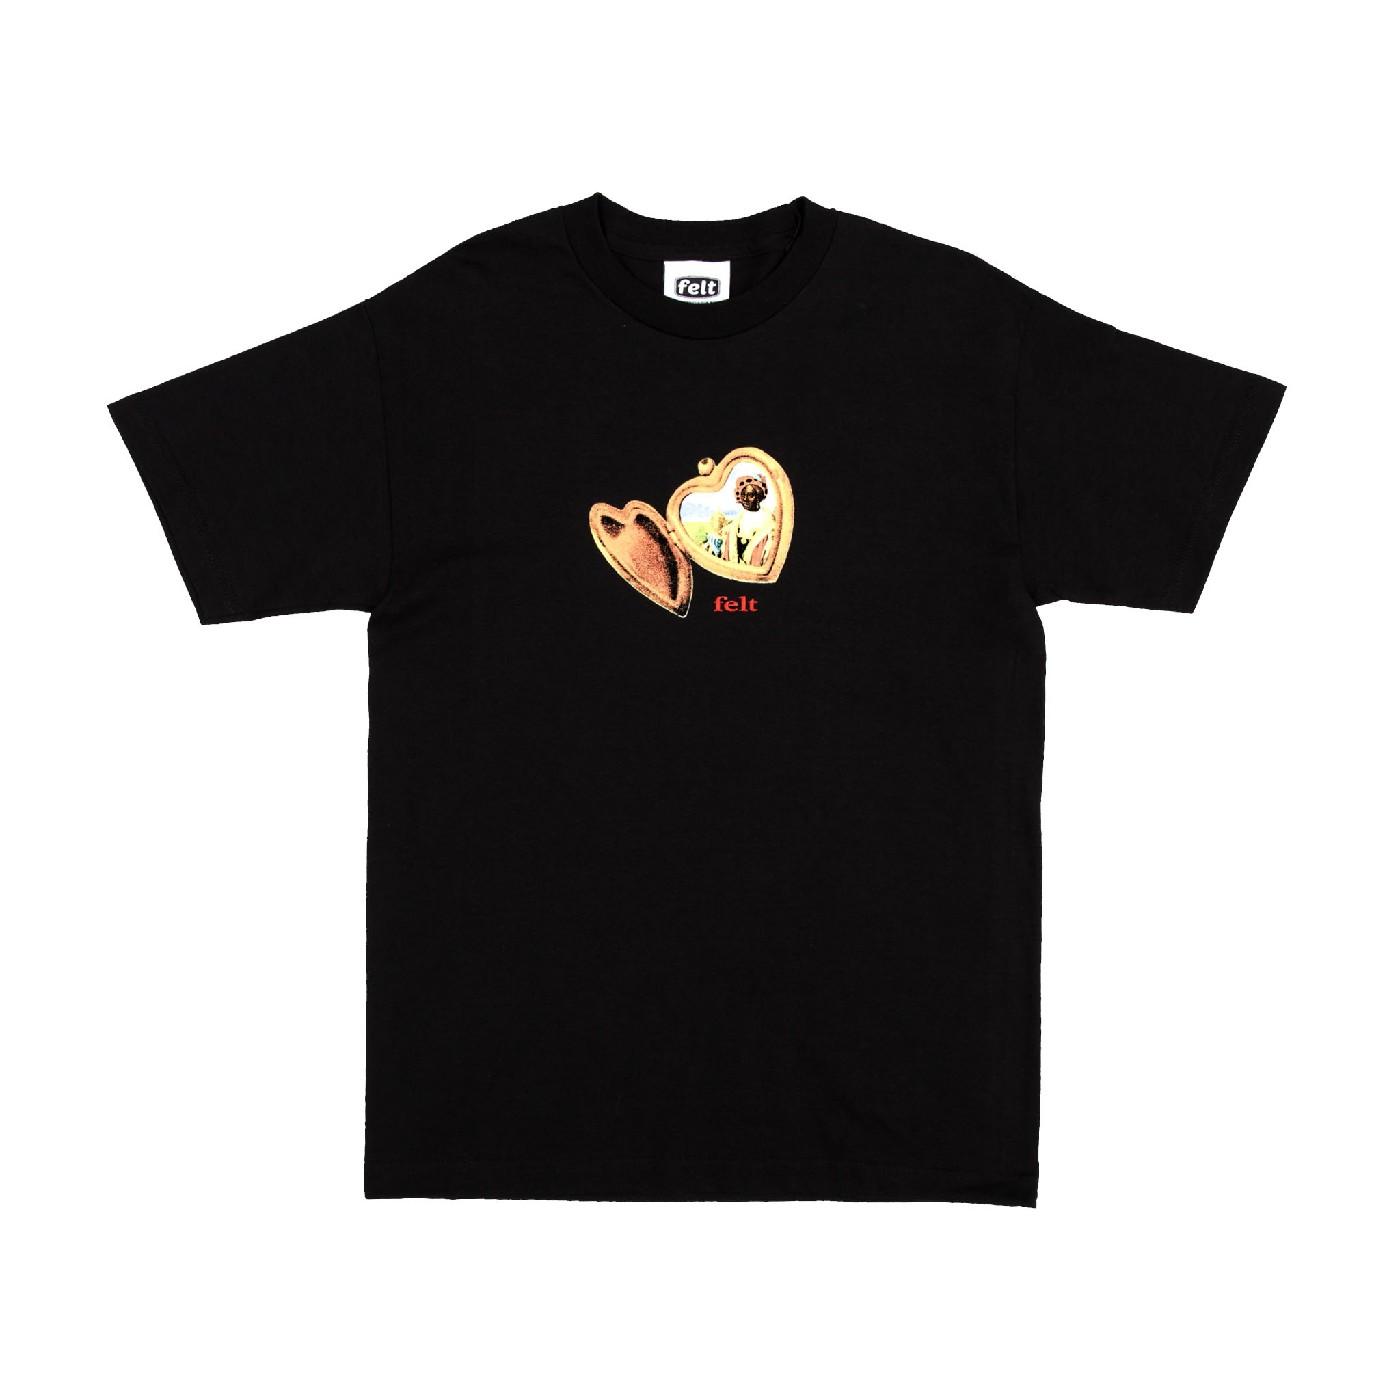 【FELT/フェルト】BLACK MAGUS T-SHIRT Tシャツ / BLK